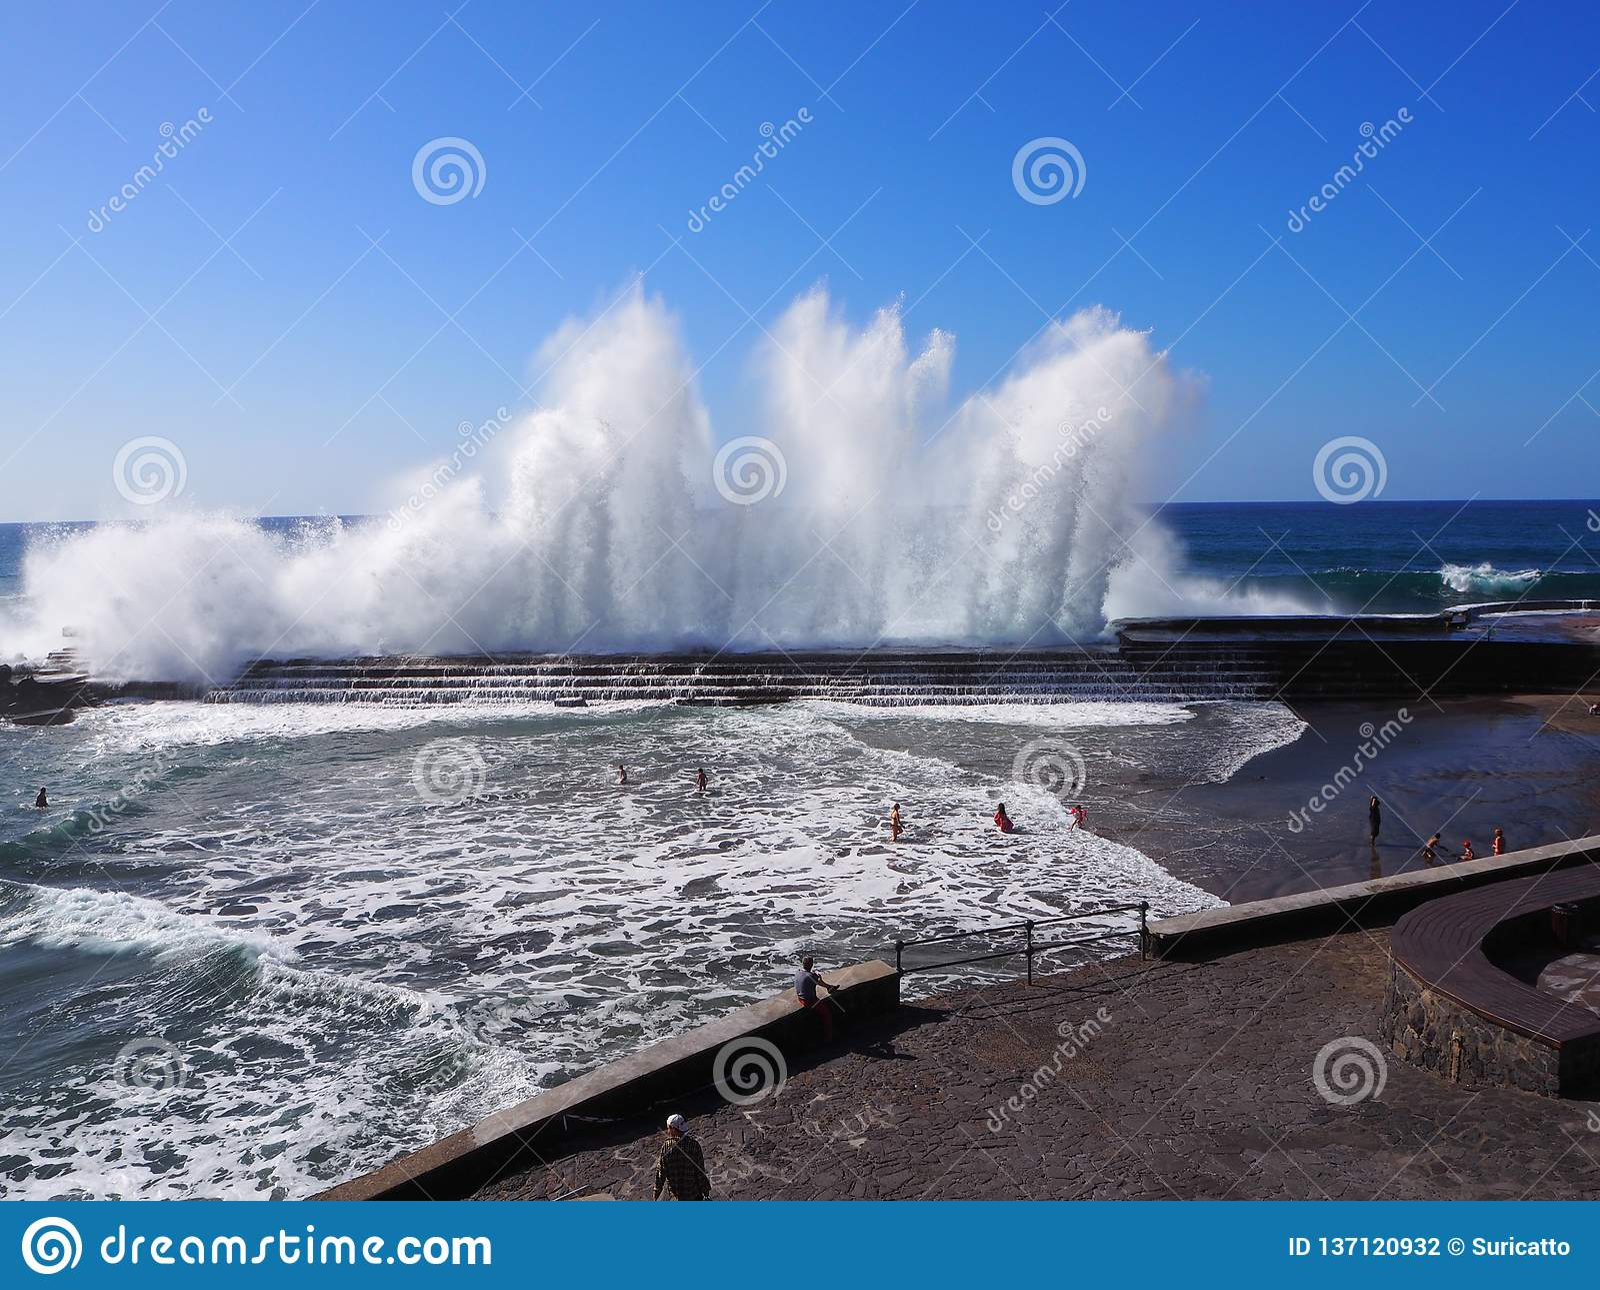 Spectacular waves breaking at Bajamar Tenerife